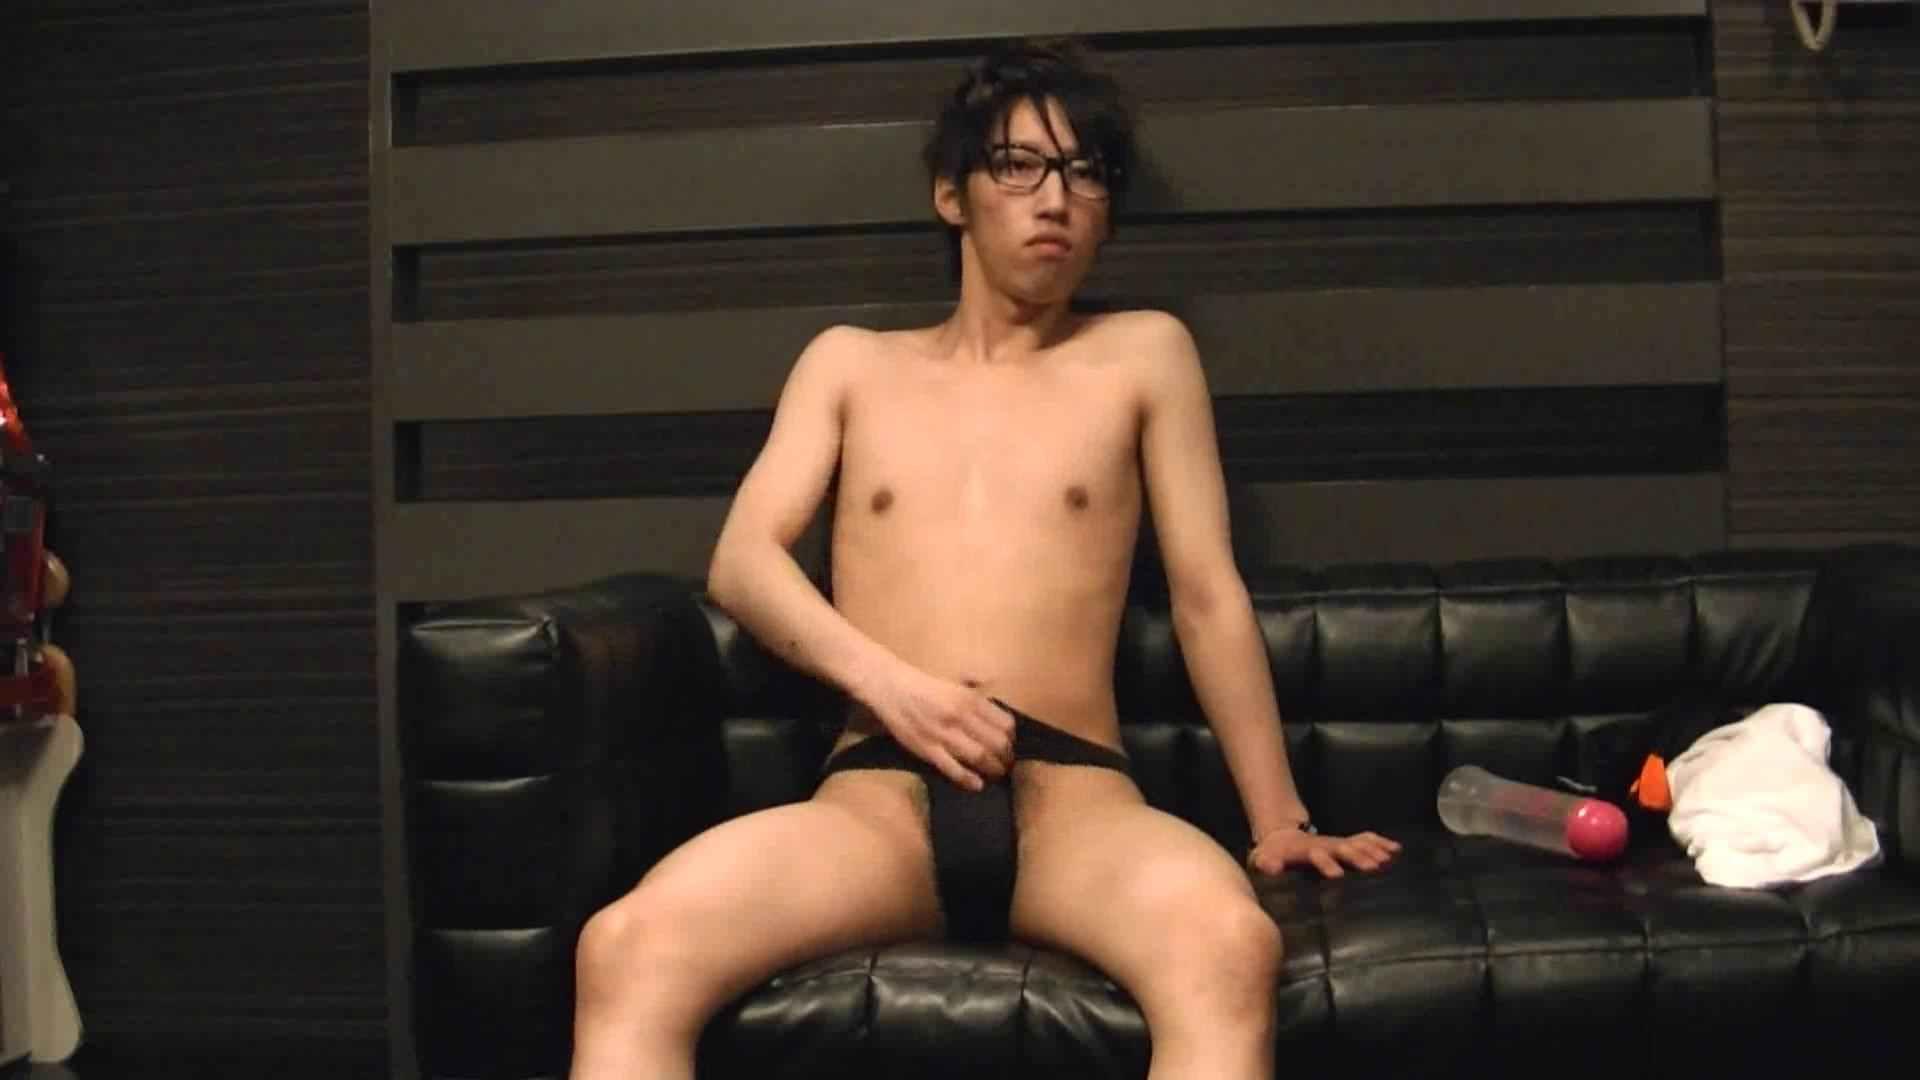 ONA見せカーニバル!! Vol3 男 ゲイ無料無修正画像 89枚 29